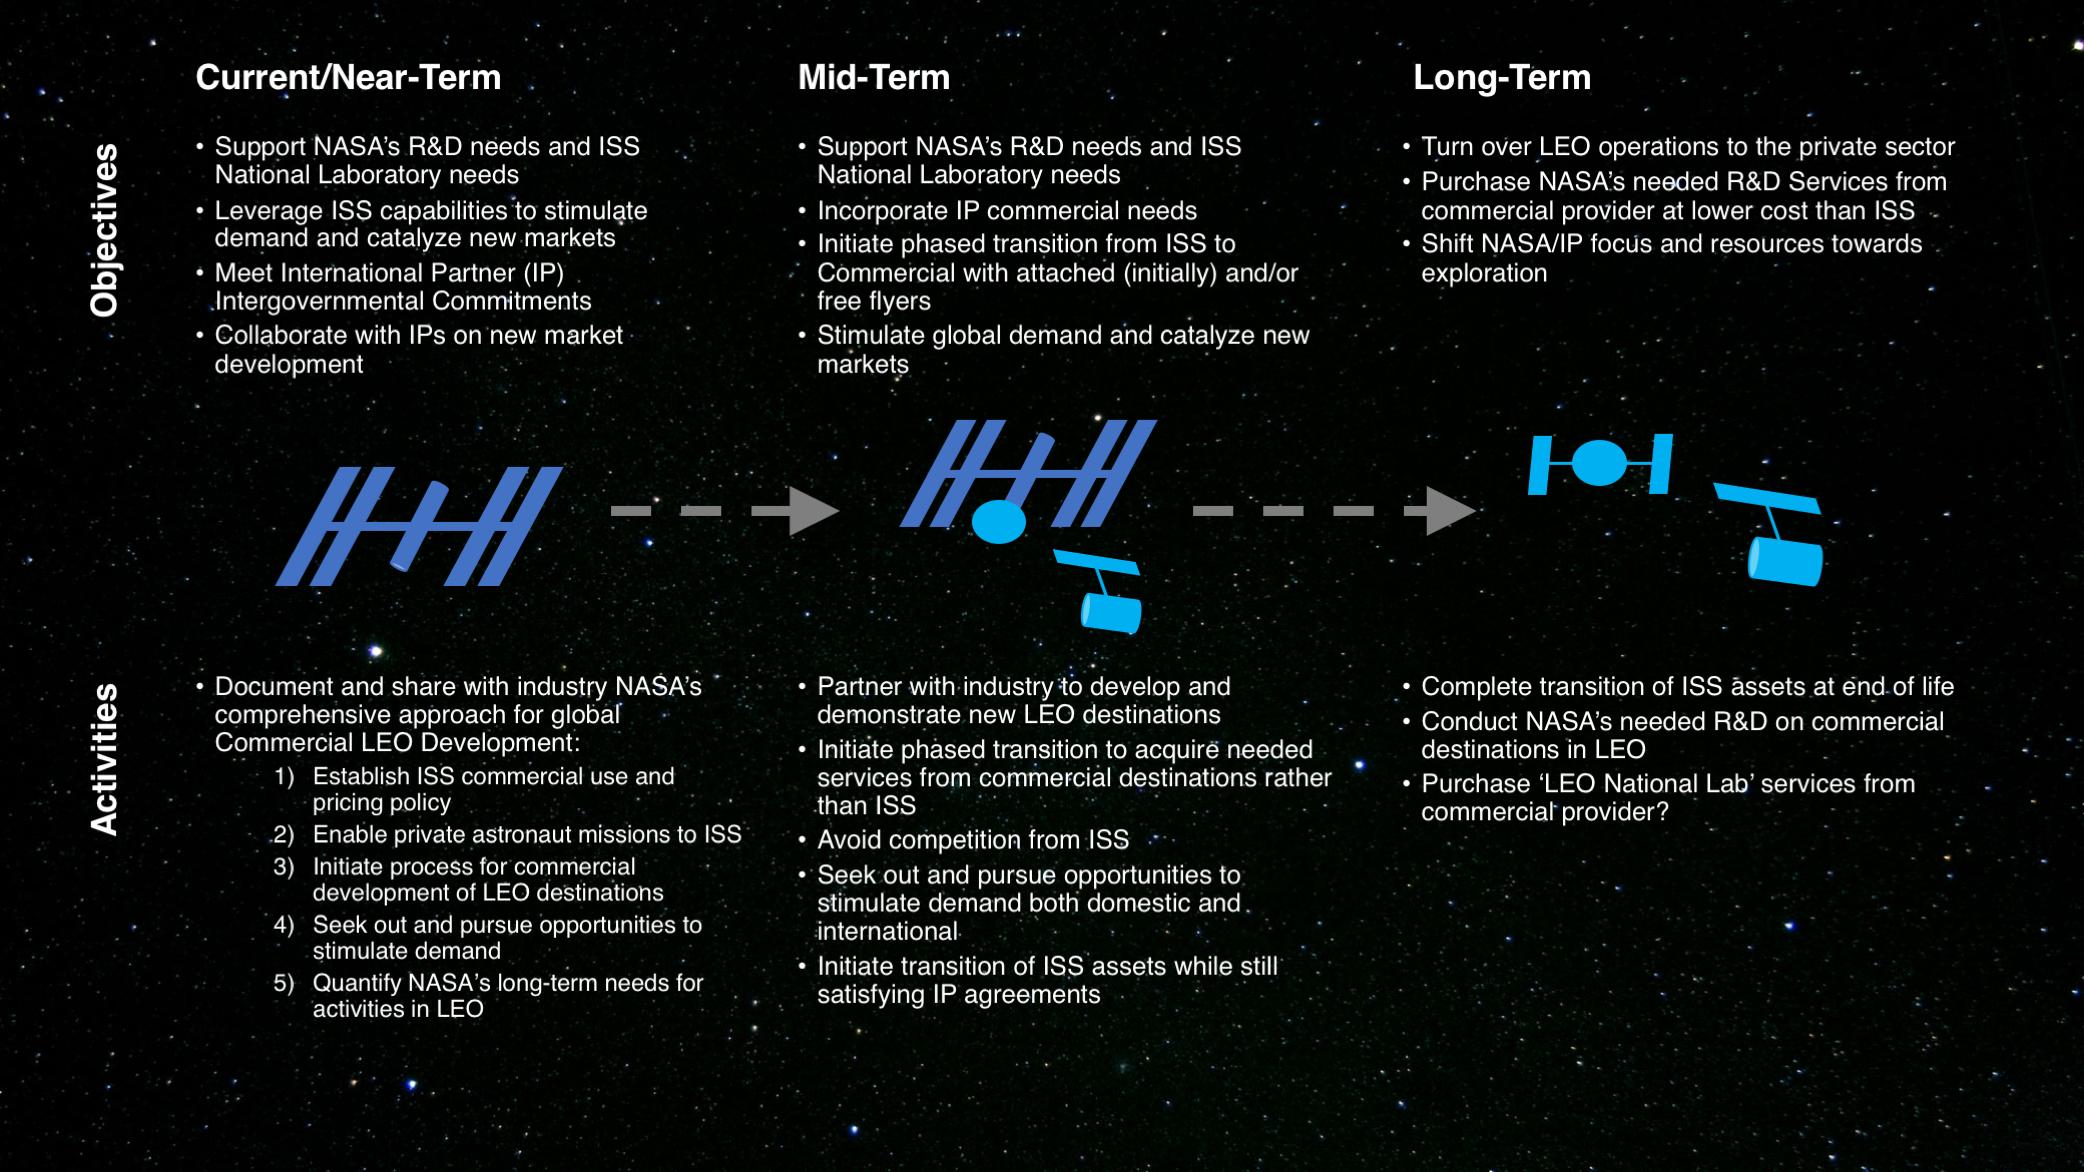 NASA's low Earth orbit transition plan. Credit: NASA